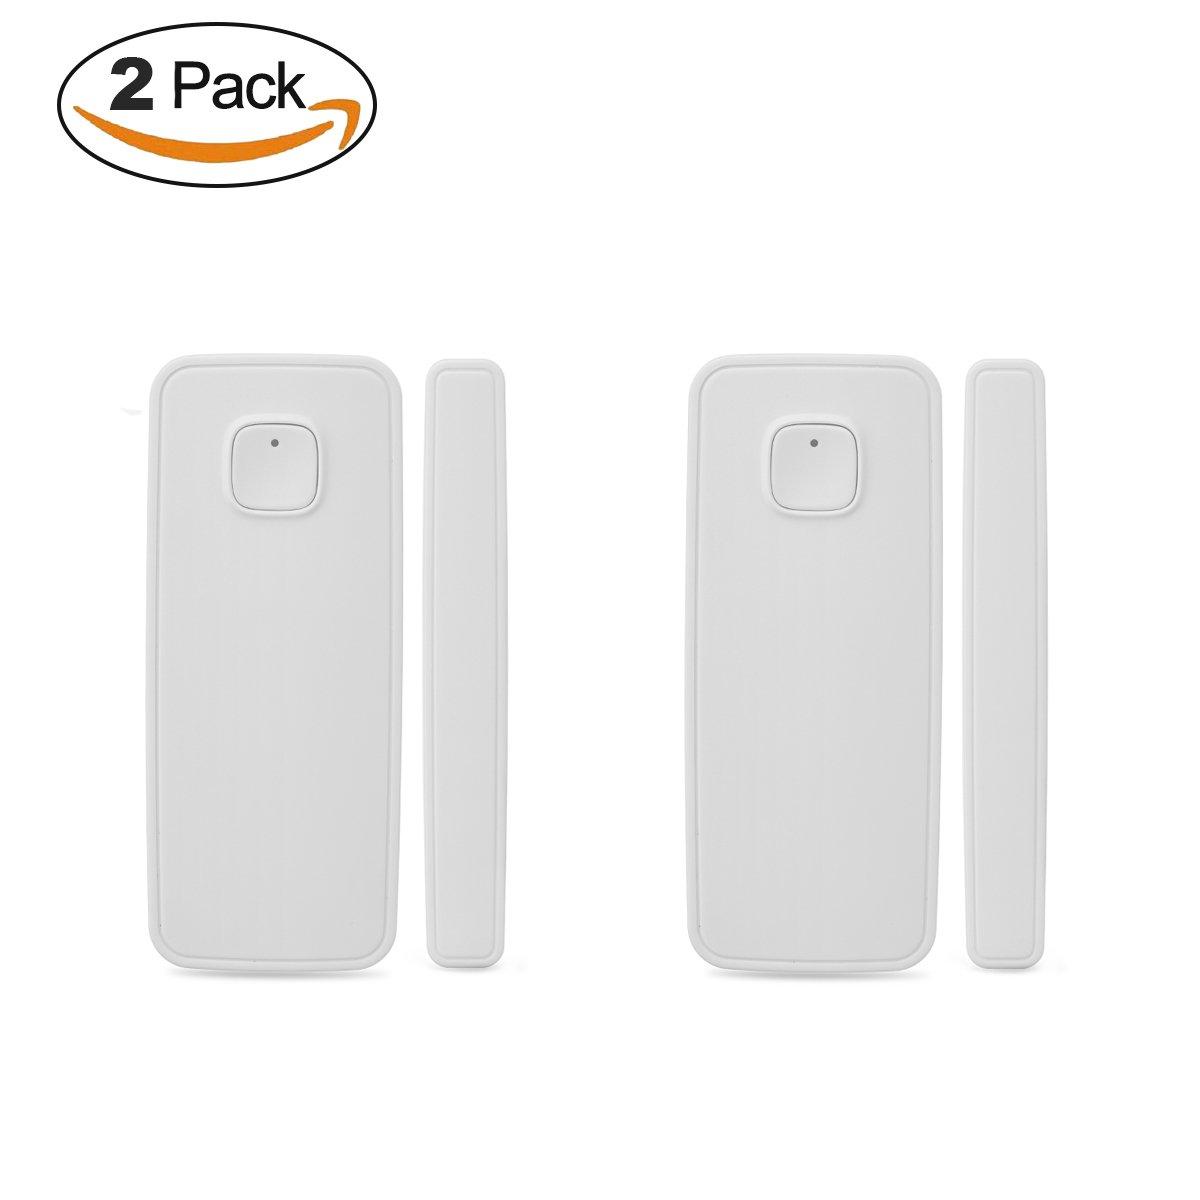 DZX WIFI Home Security Door Sensor Alarm System with Easy App Control for IOS Android Smartphone with Alexa Echo Google Home Door/Window Contact Sensor no Hub Need